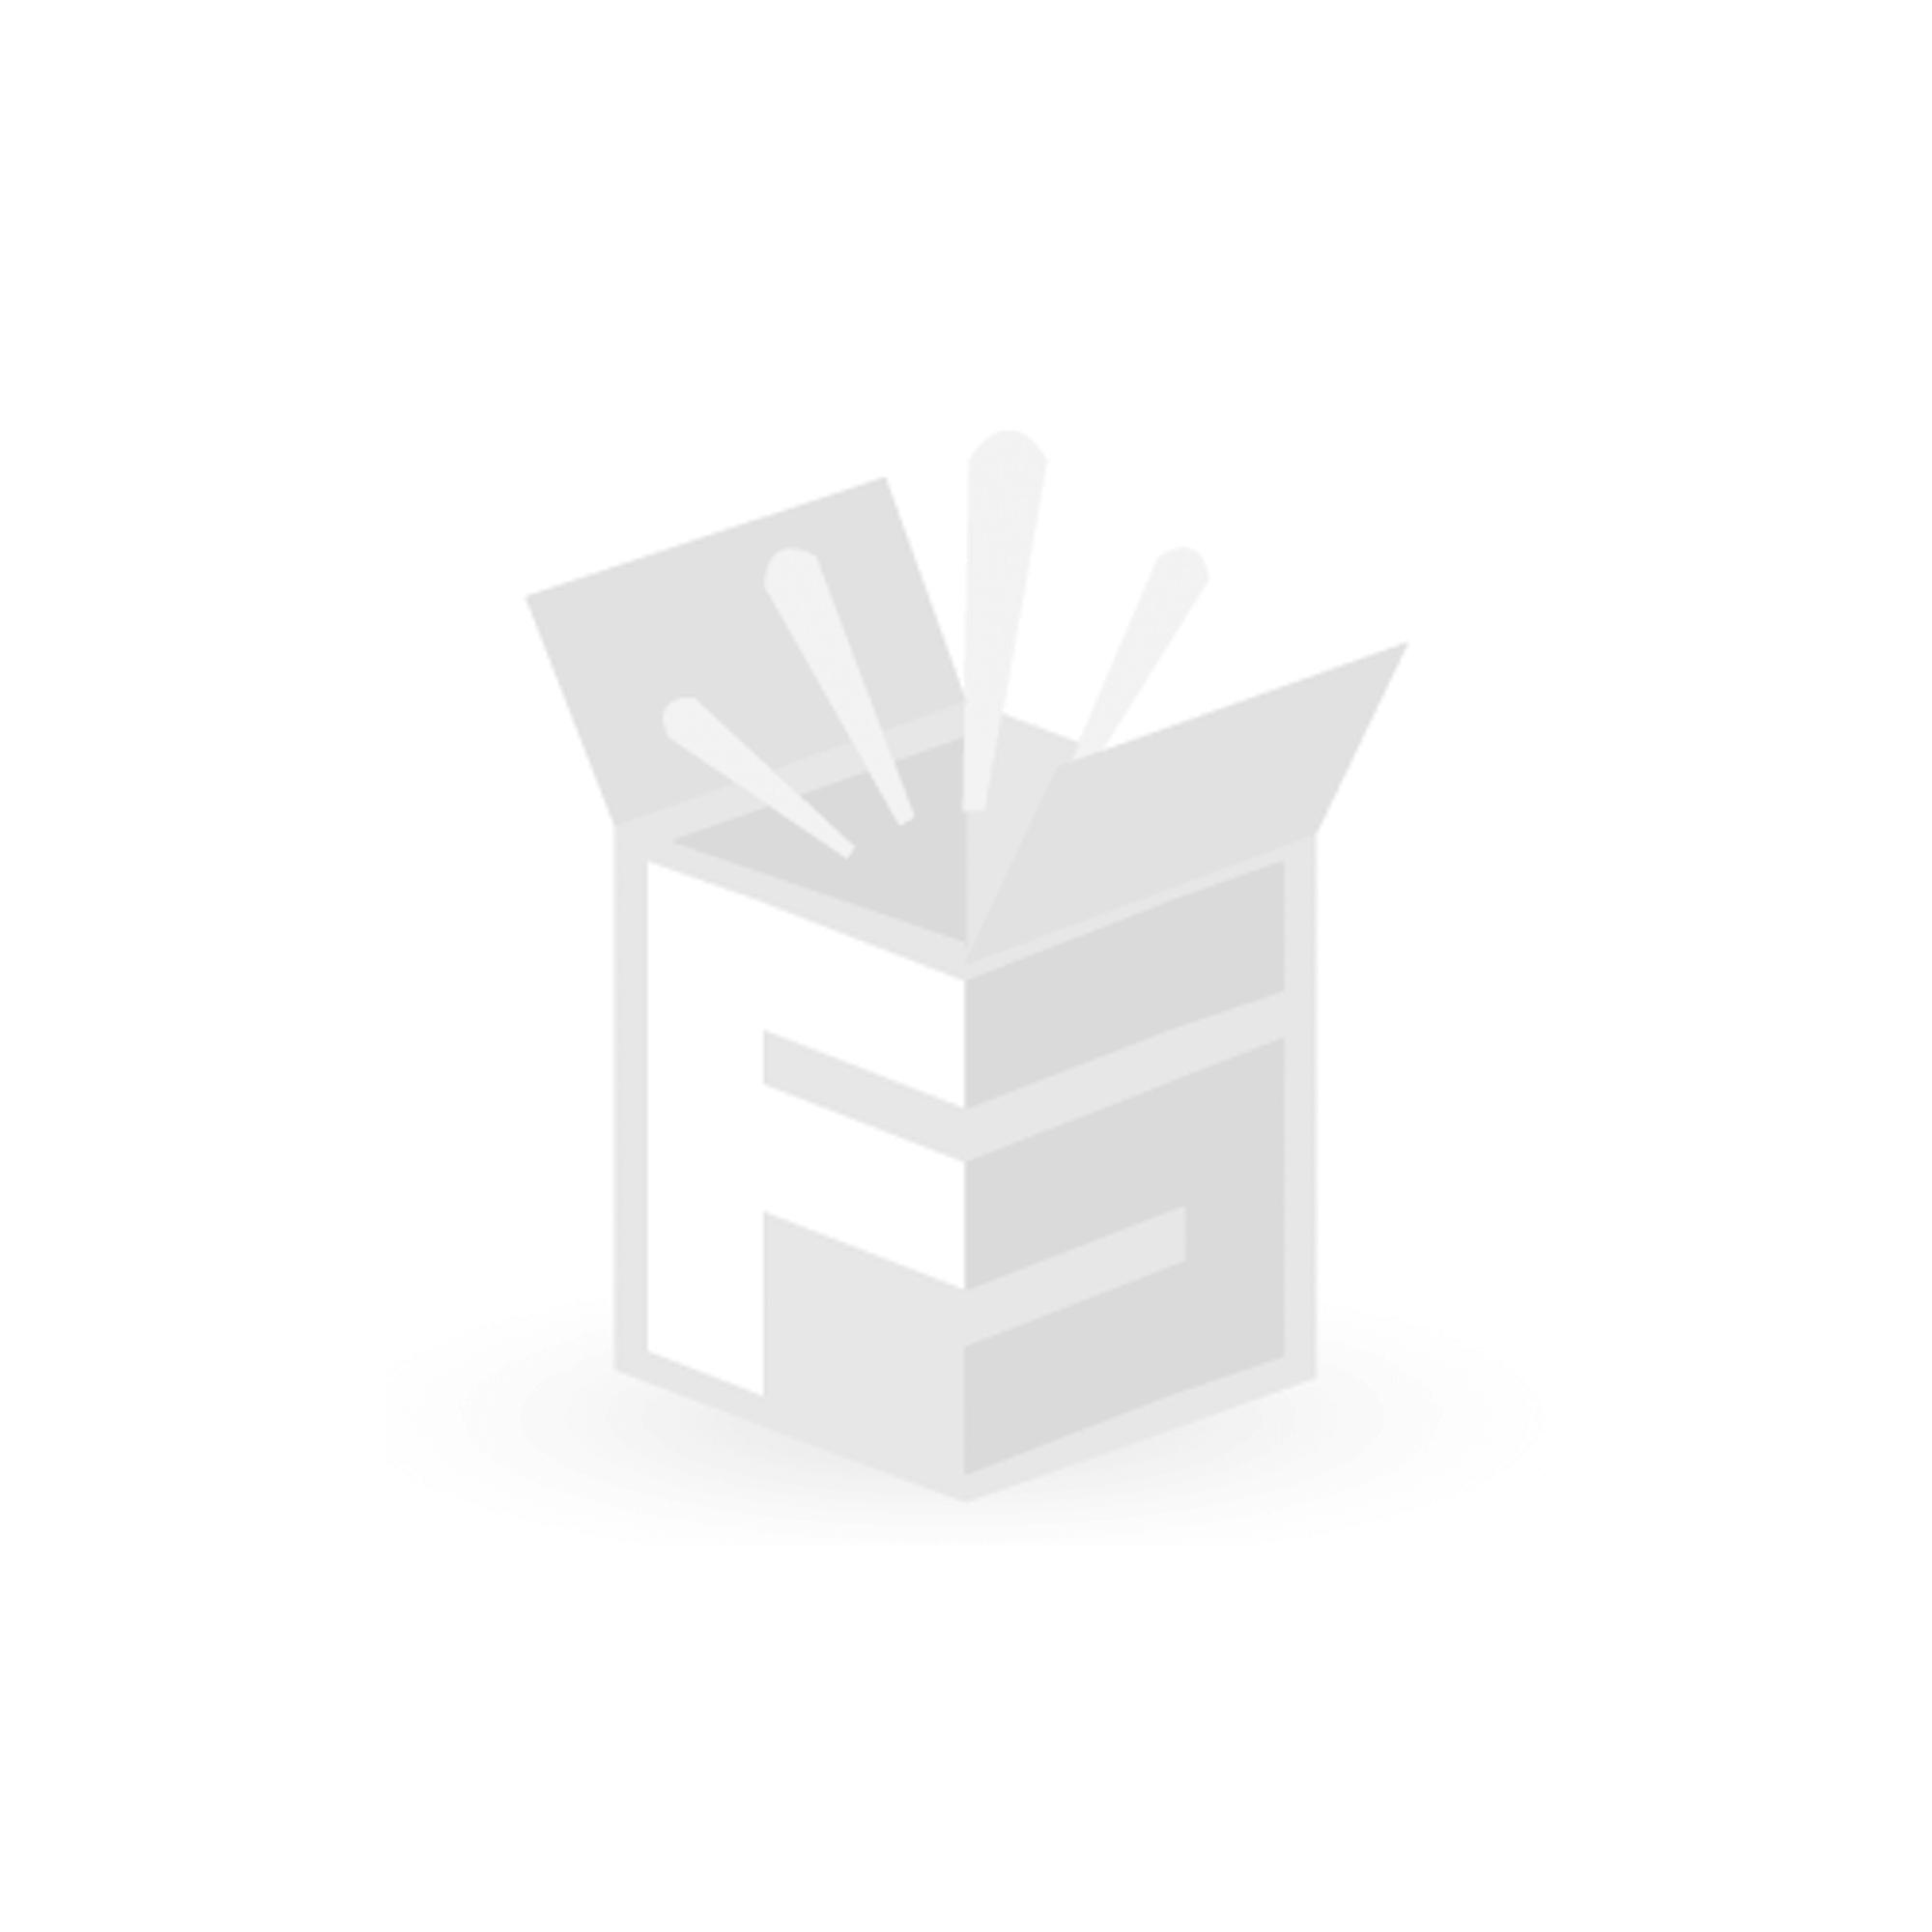 Alpina Besteck-Set 16-teilig